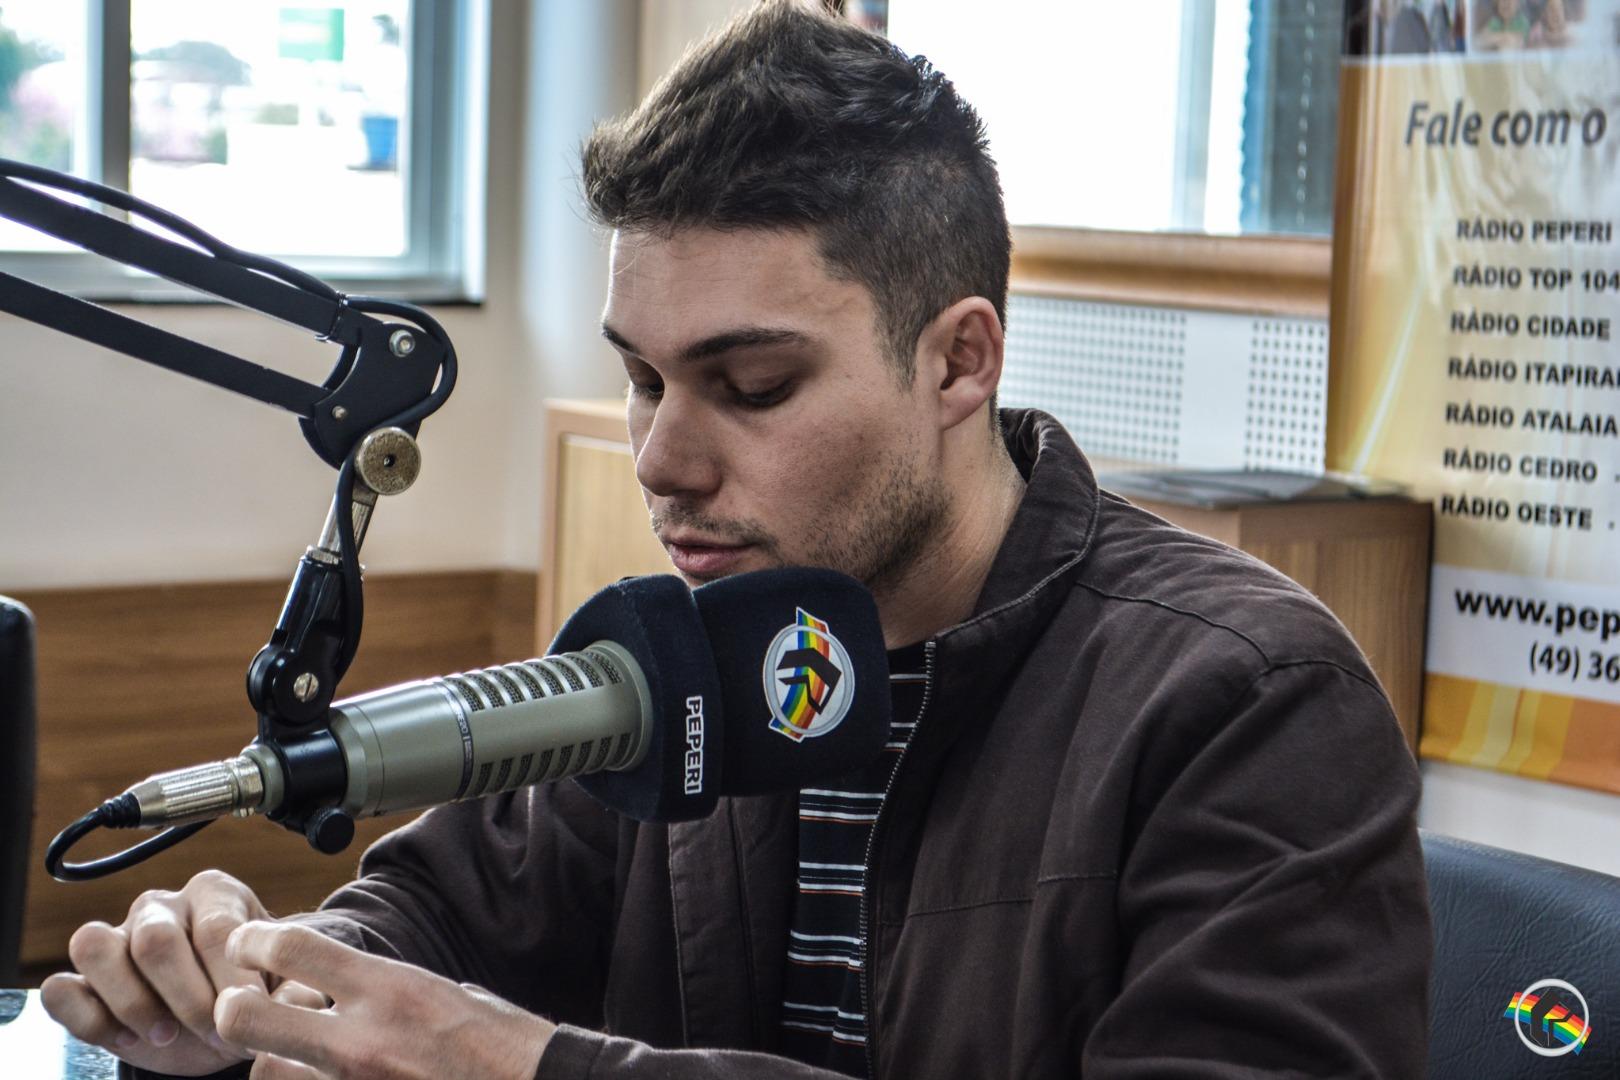 VÍDEO: Peperi Rádio Repórter fala sobre o Agosto Laranja